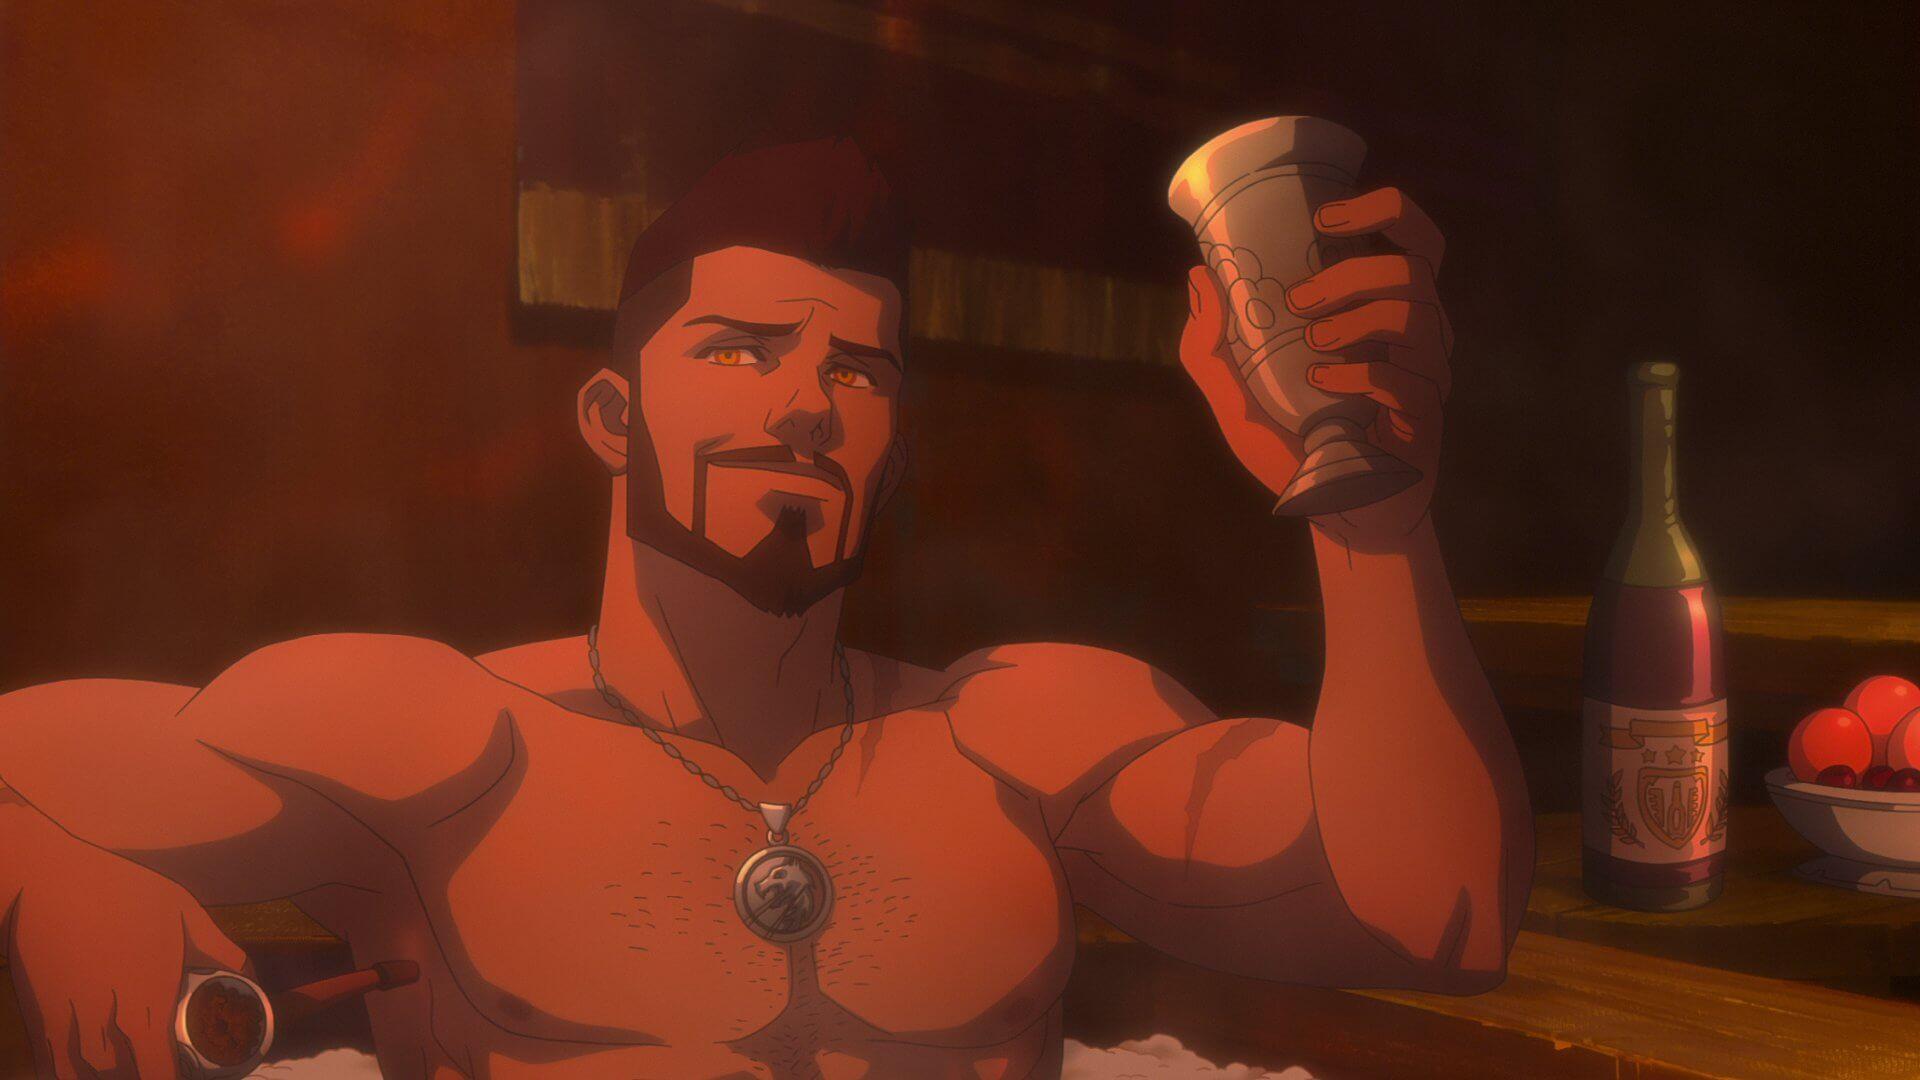 El anime The Witcher: La Pesadilla del Lobo ha revelado su primer tráiler